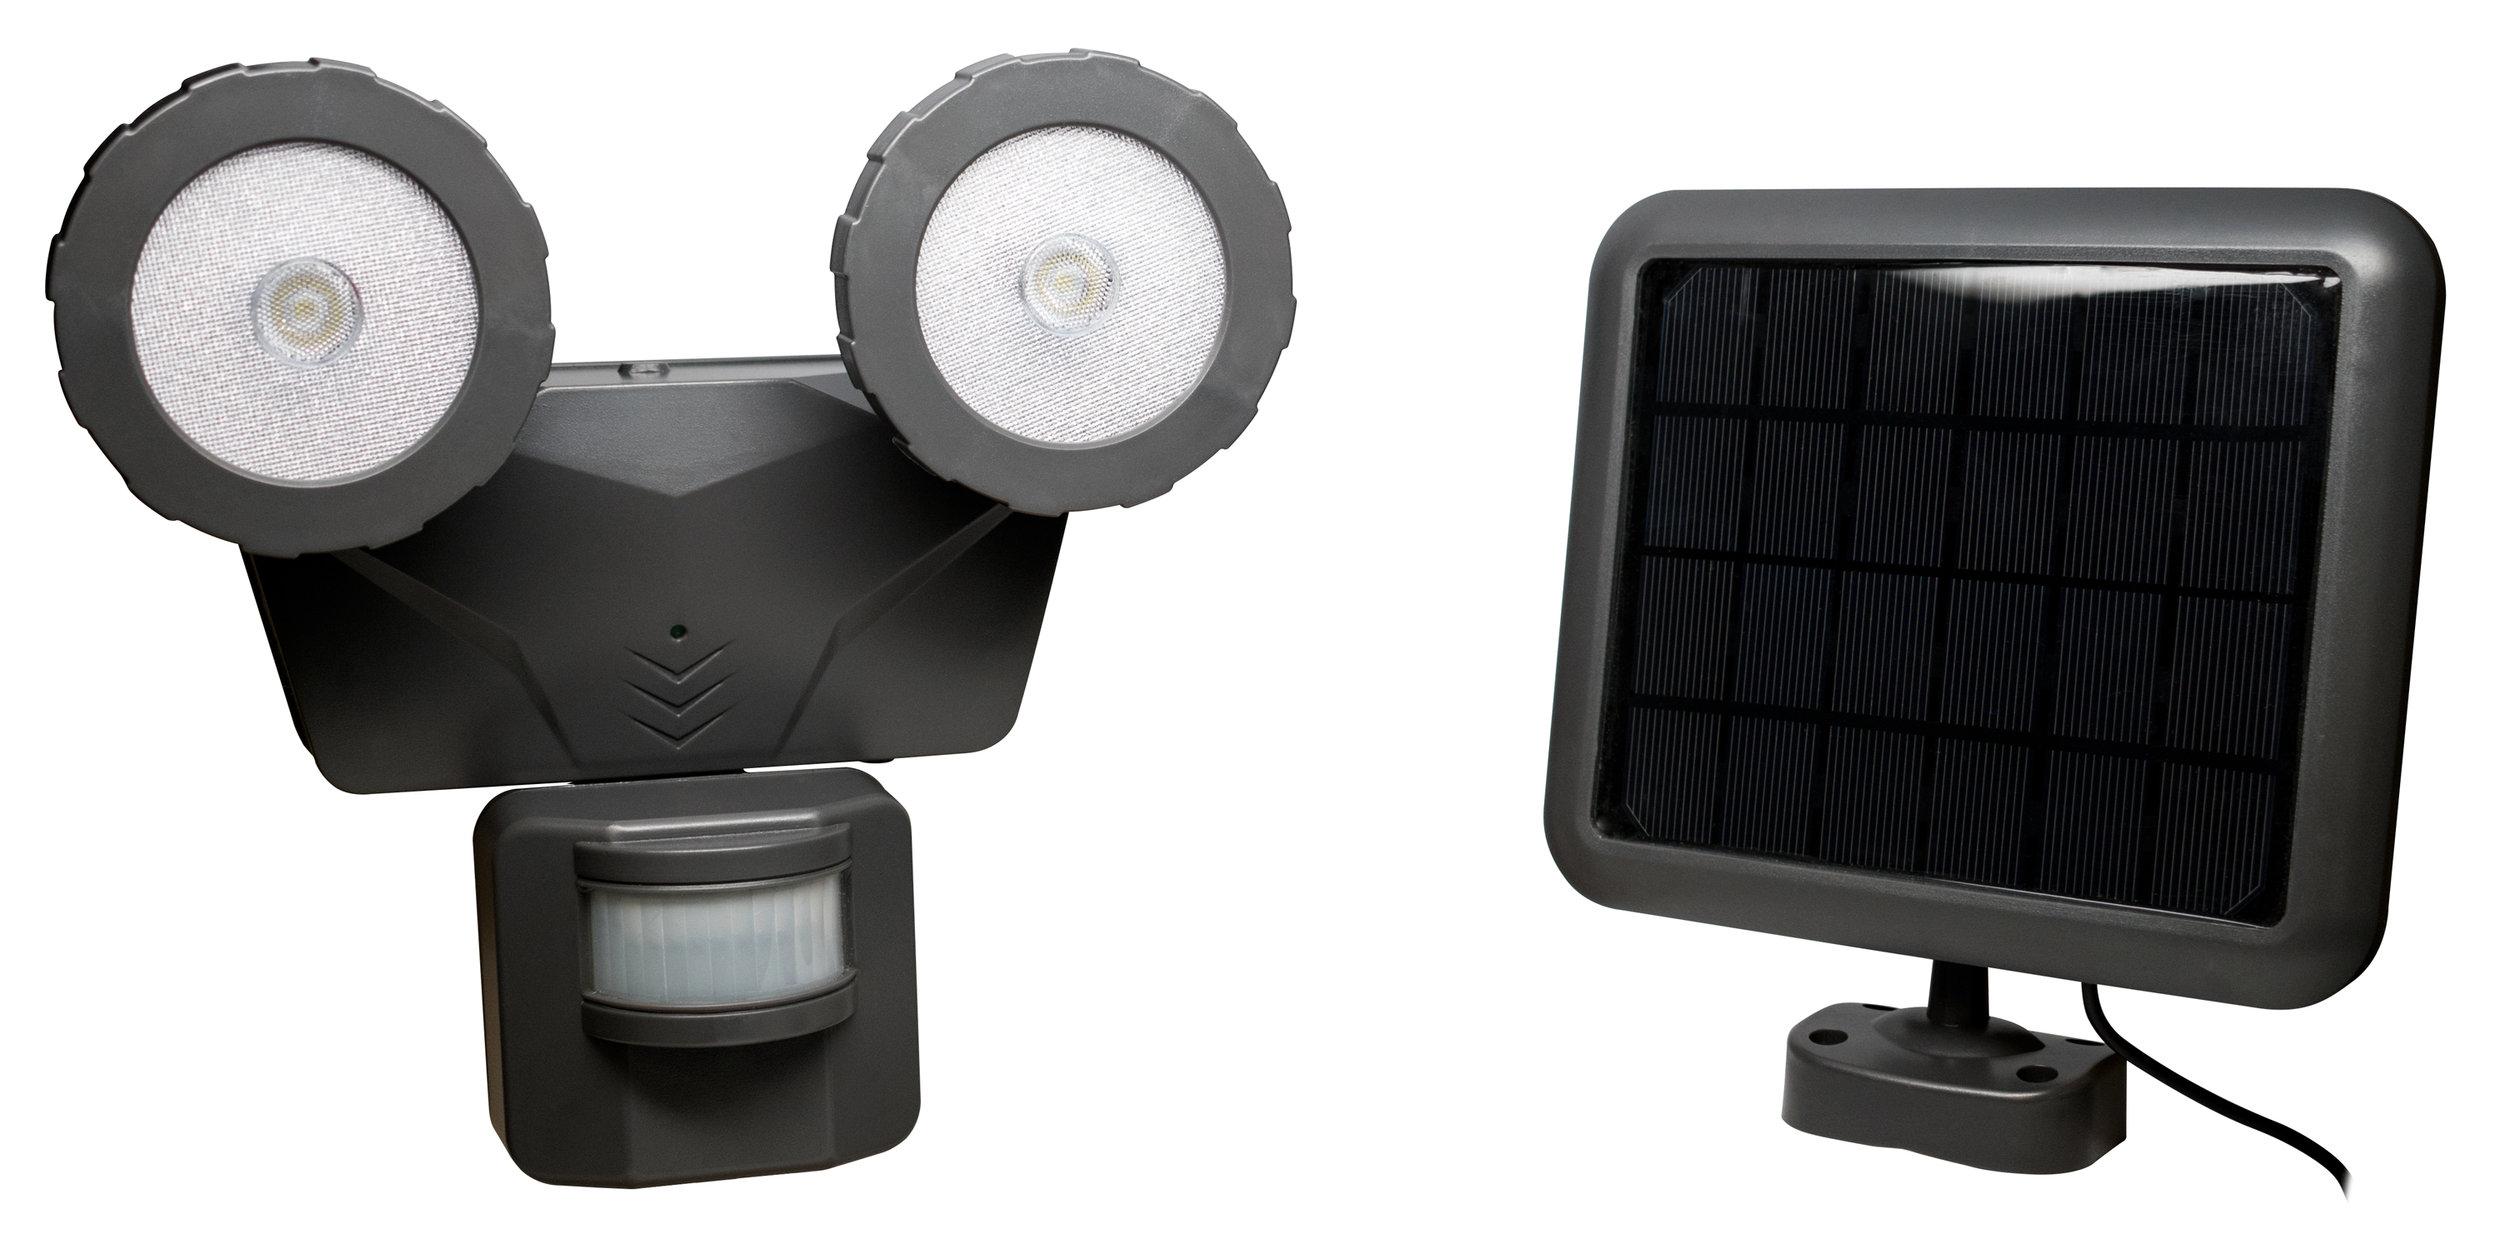 Novolink DSB1 Lamp and Solar Panel